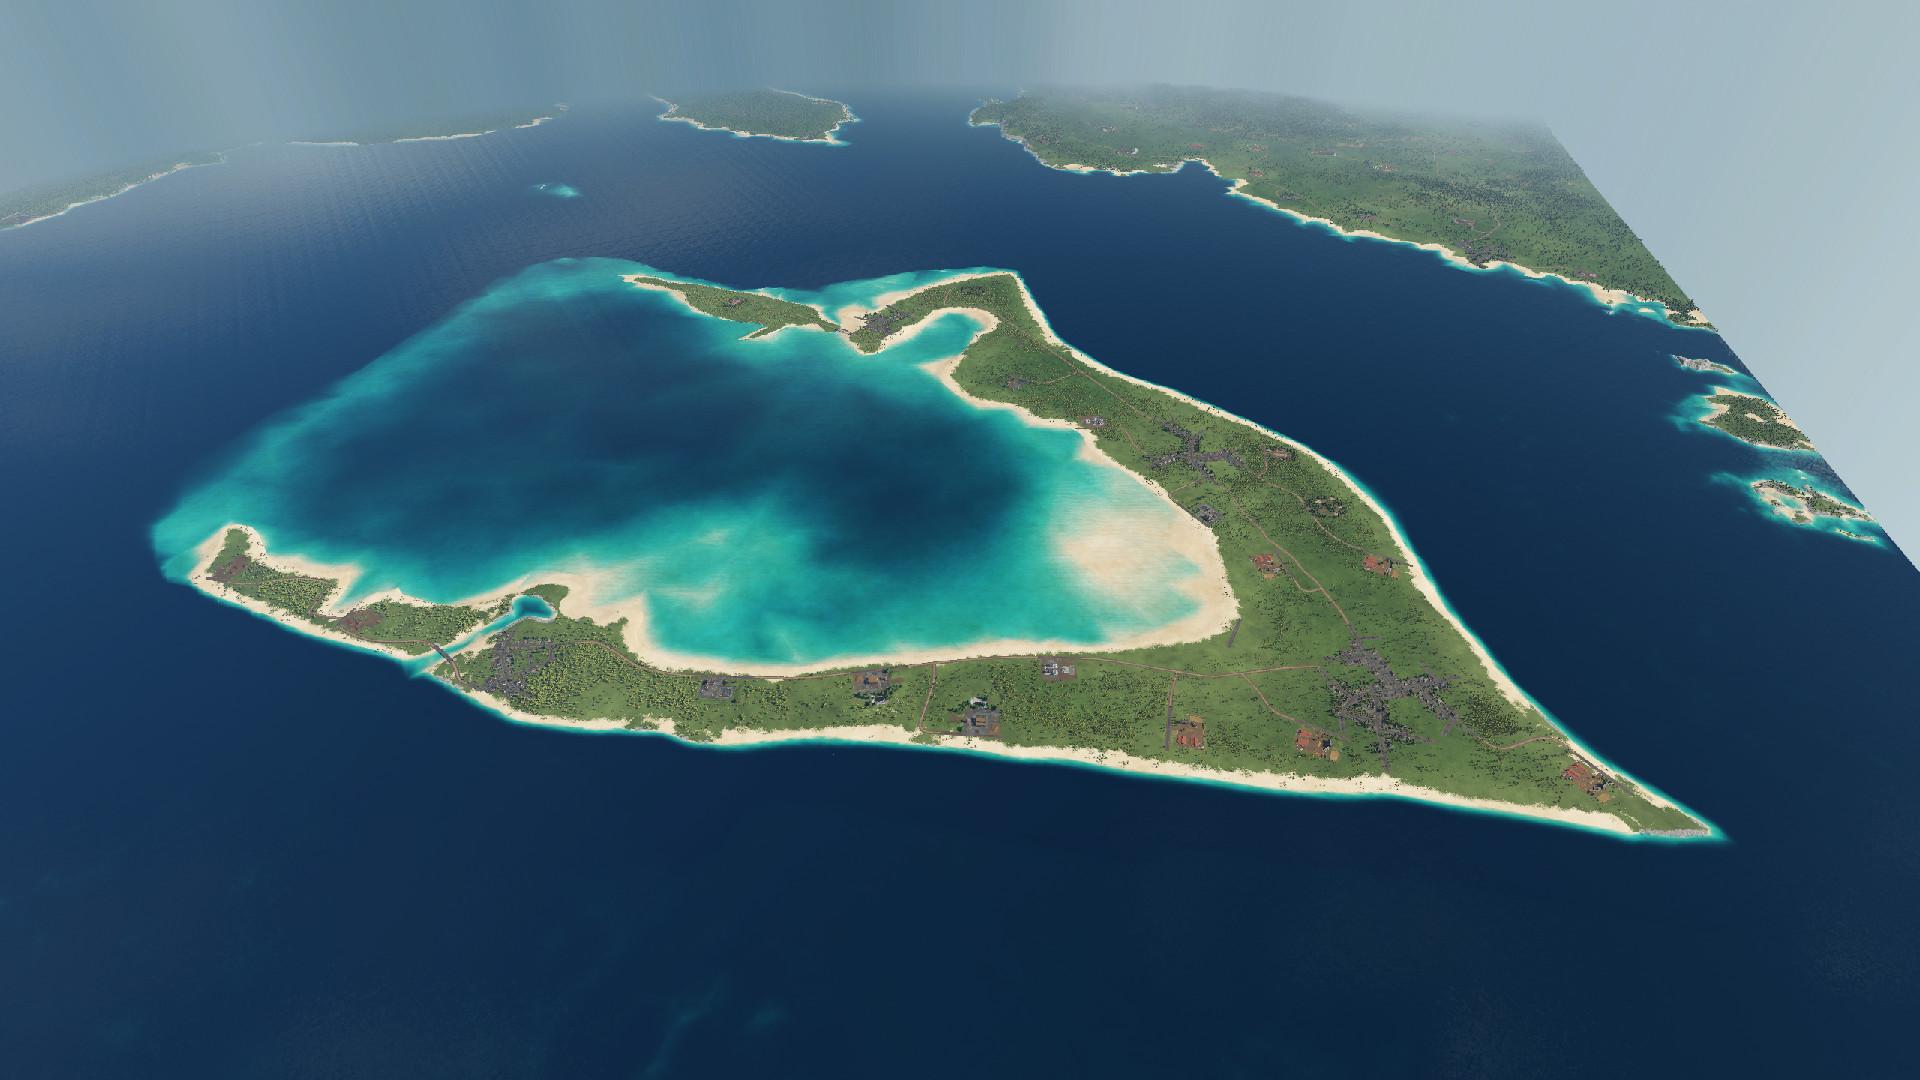 Transport Fever 2 - Wake Island with Surrounding Land Map